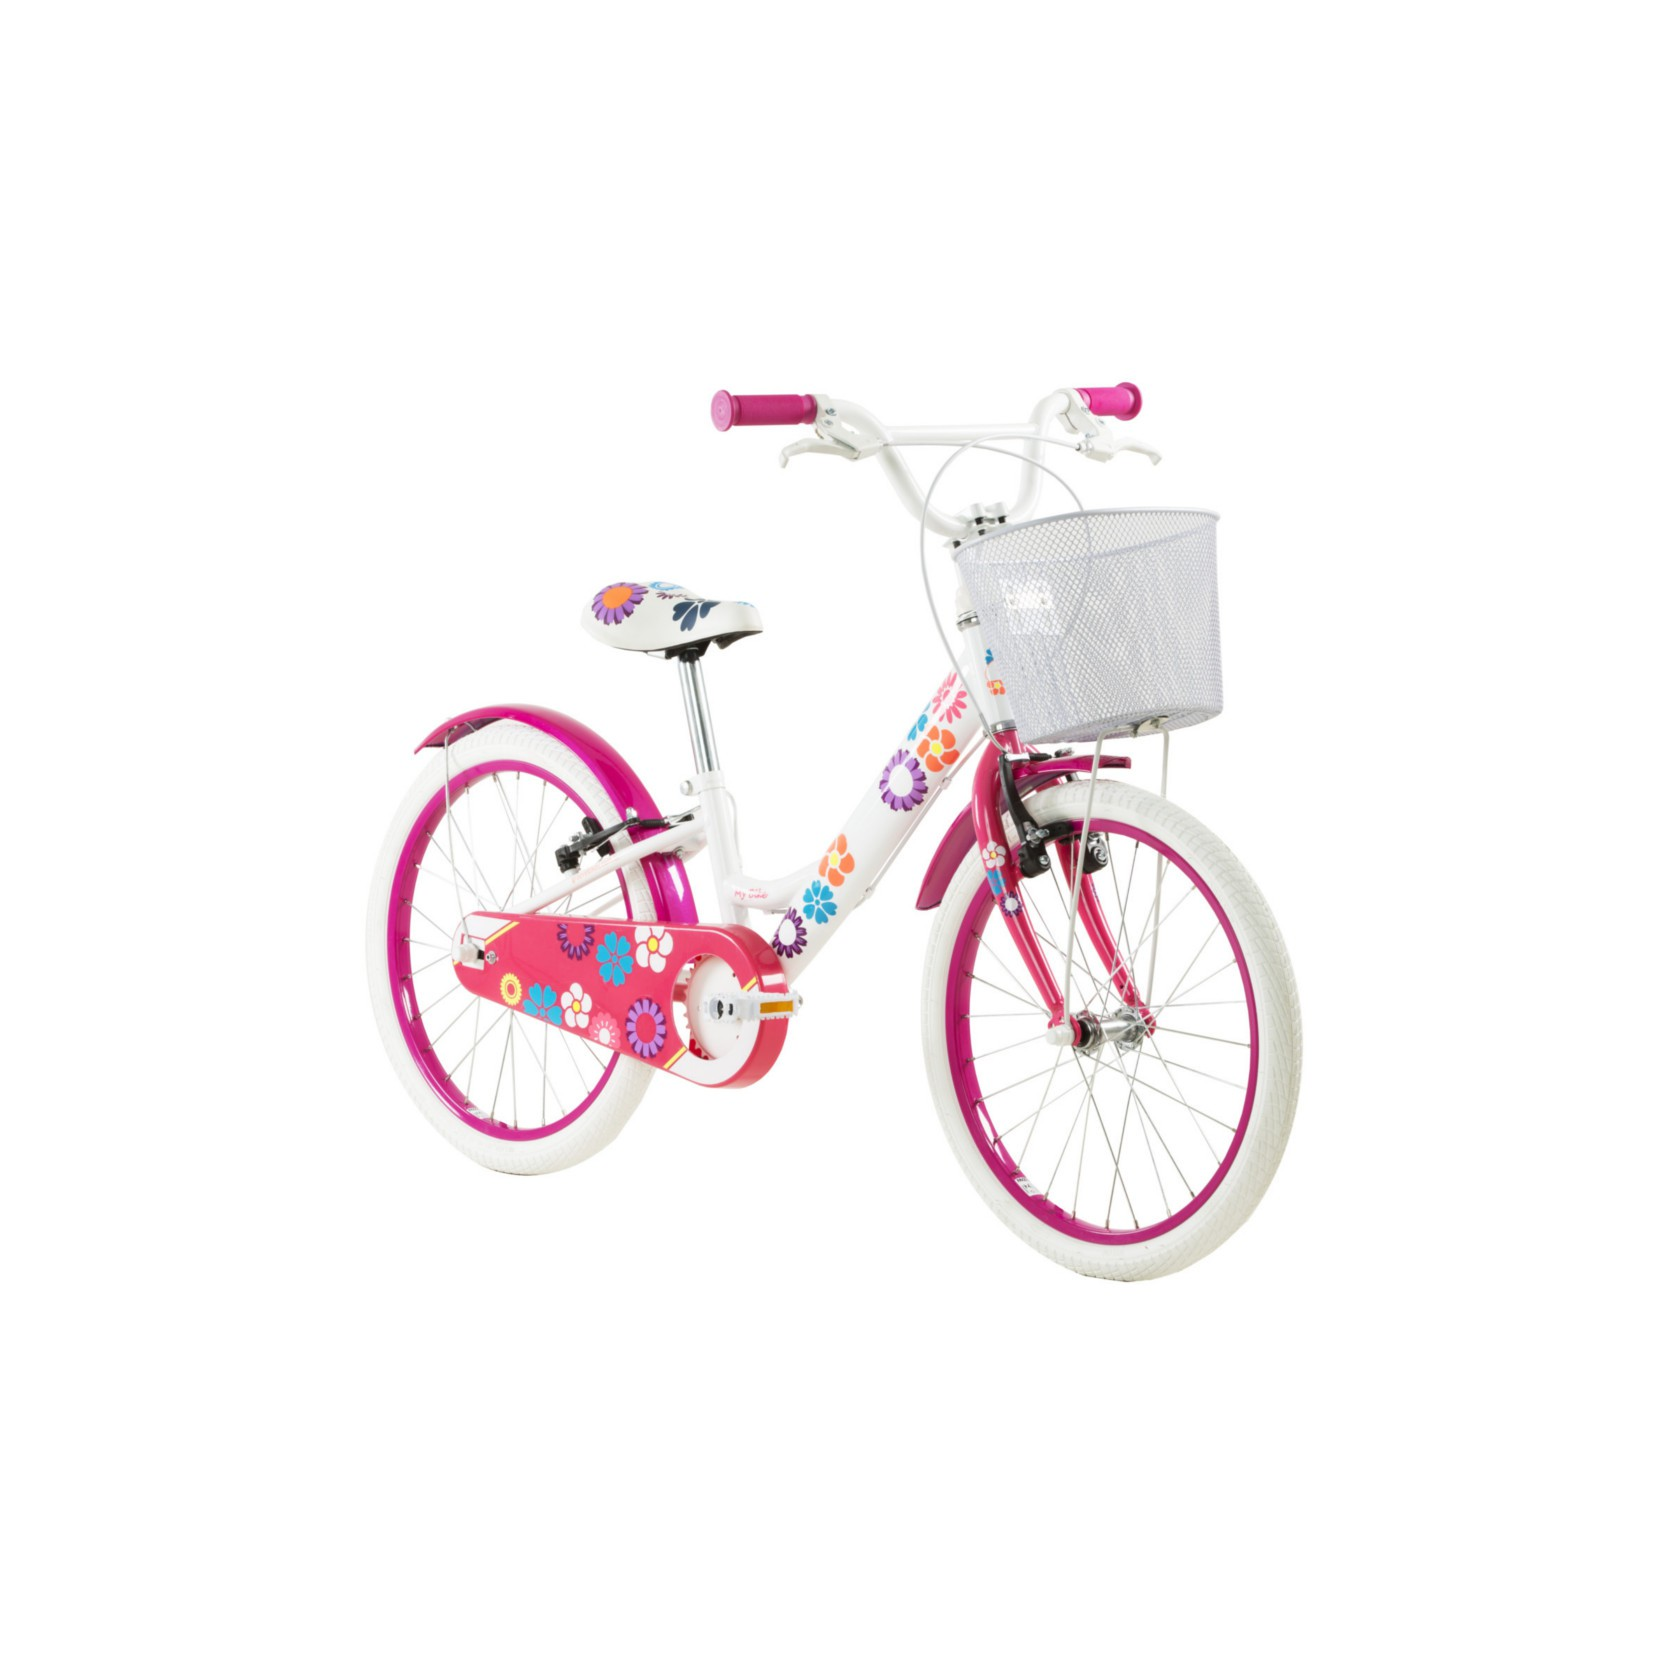 Bicicleta Infantil Groove My Bike Aro 20 2020